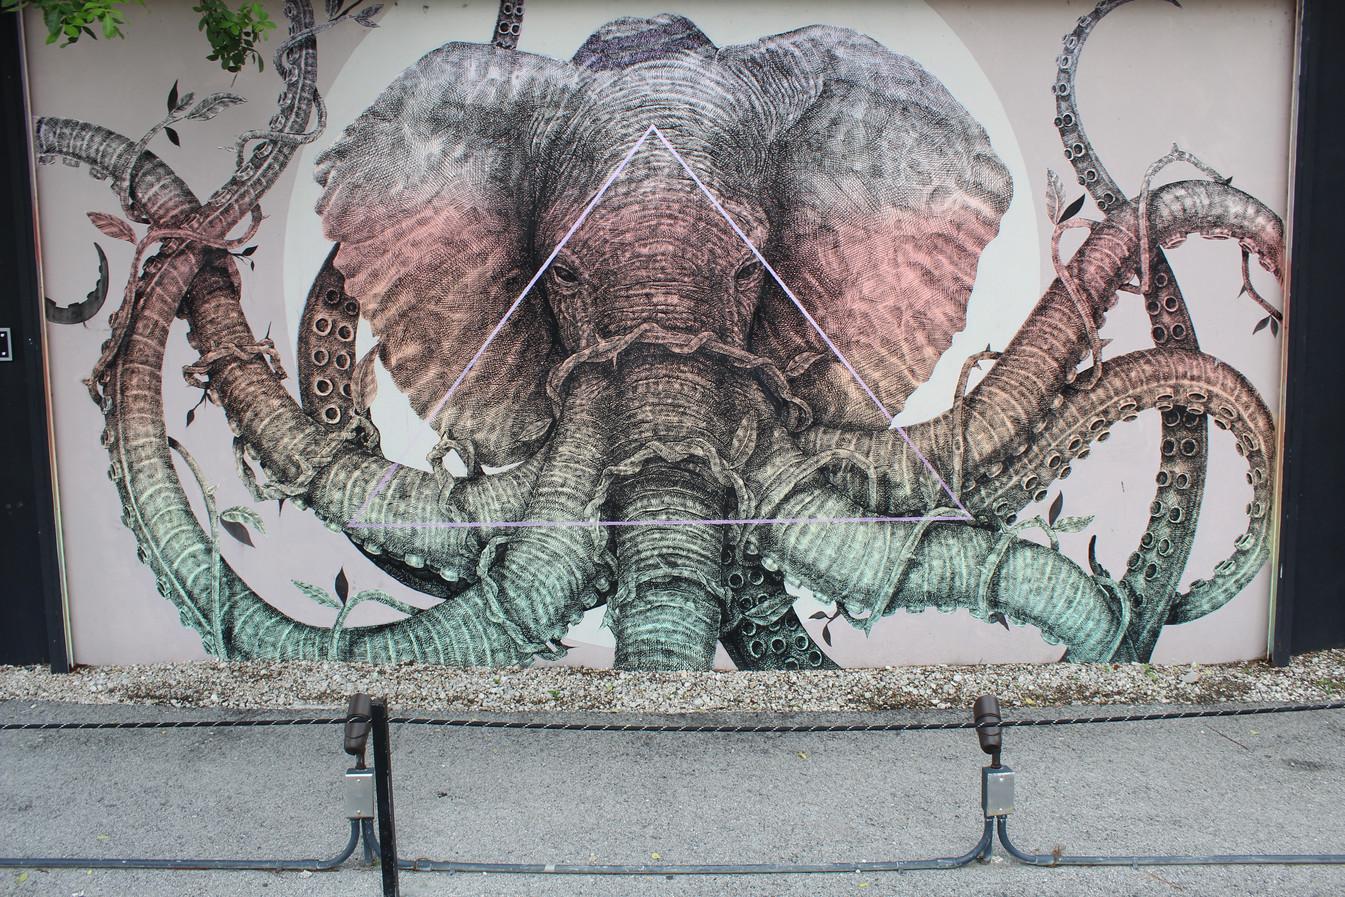 hollywood hamilton clothing strret art wynwood walls elephant realismn street art mural